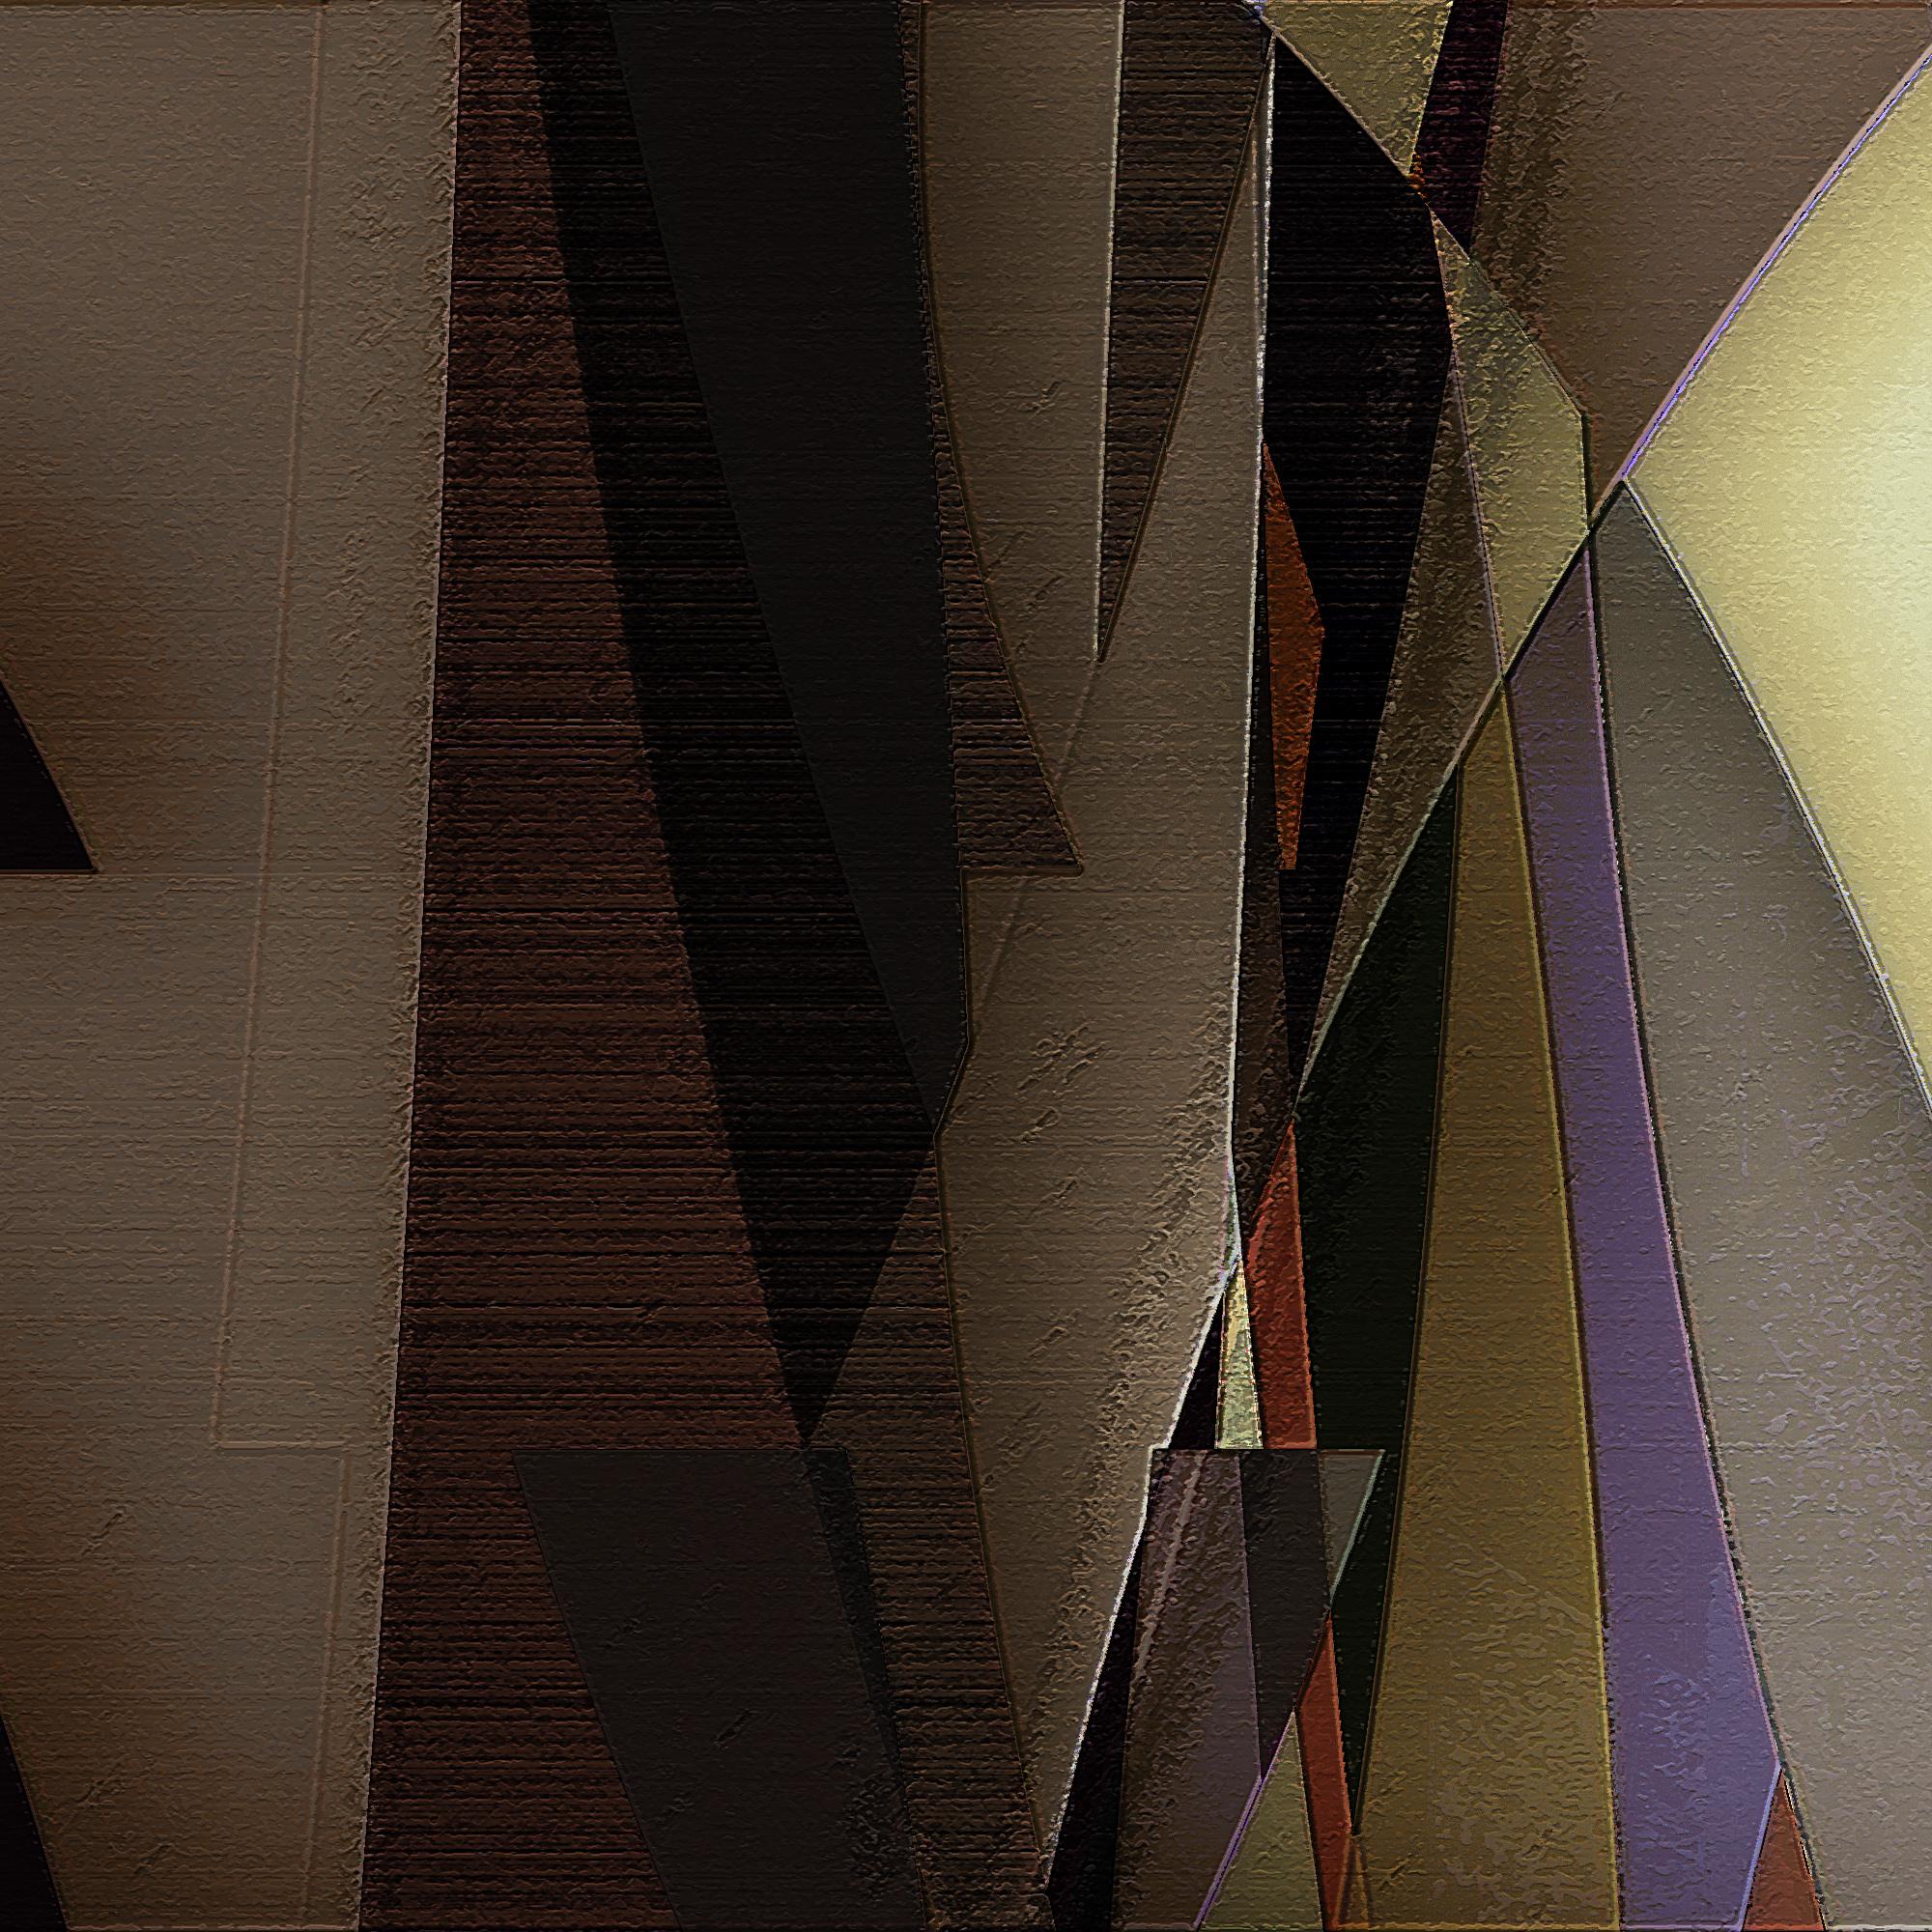 180812_Heresy_Detail3.jpg